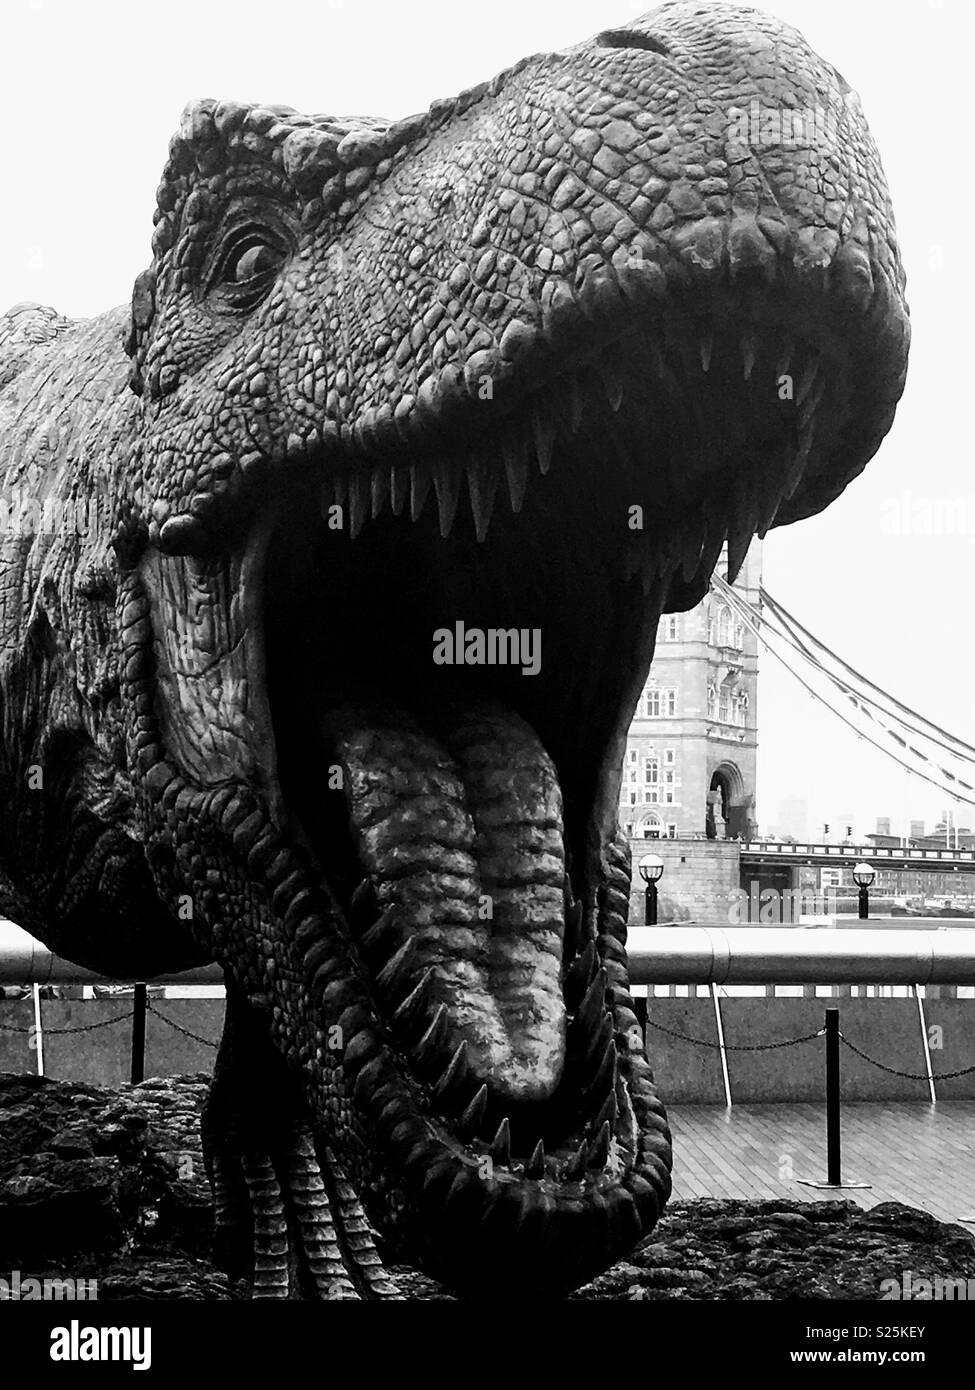 Dinosaur near City Hall and Tower Bridge in London - Stock Image